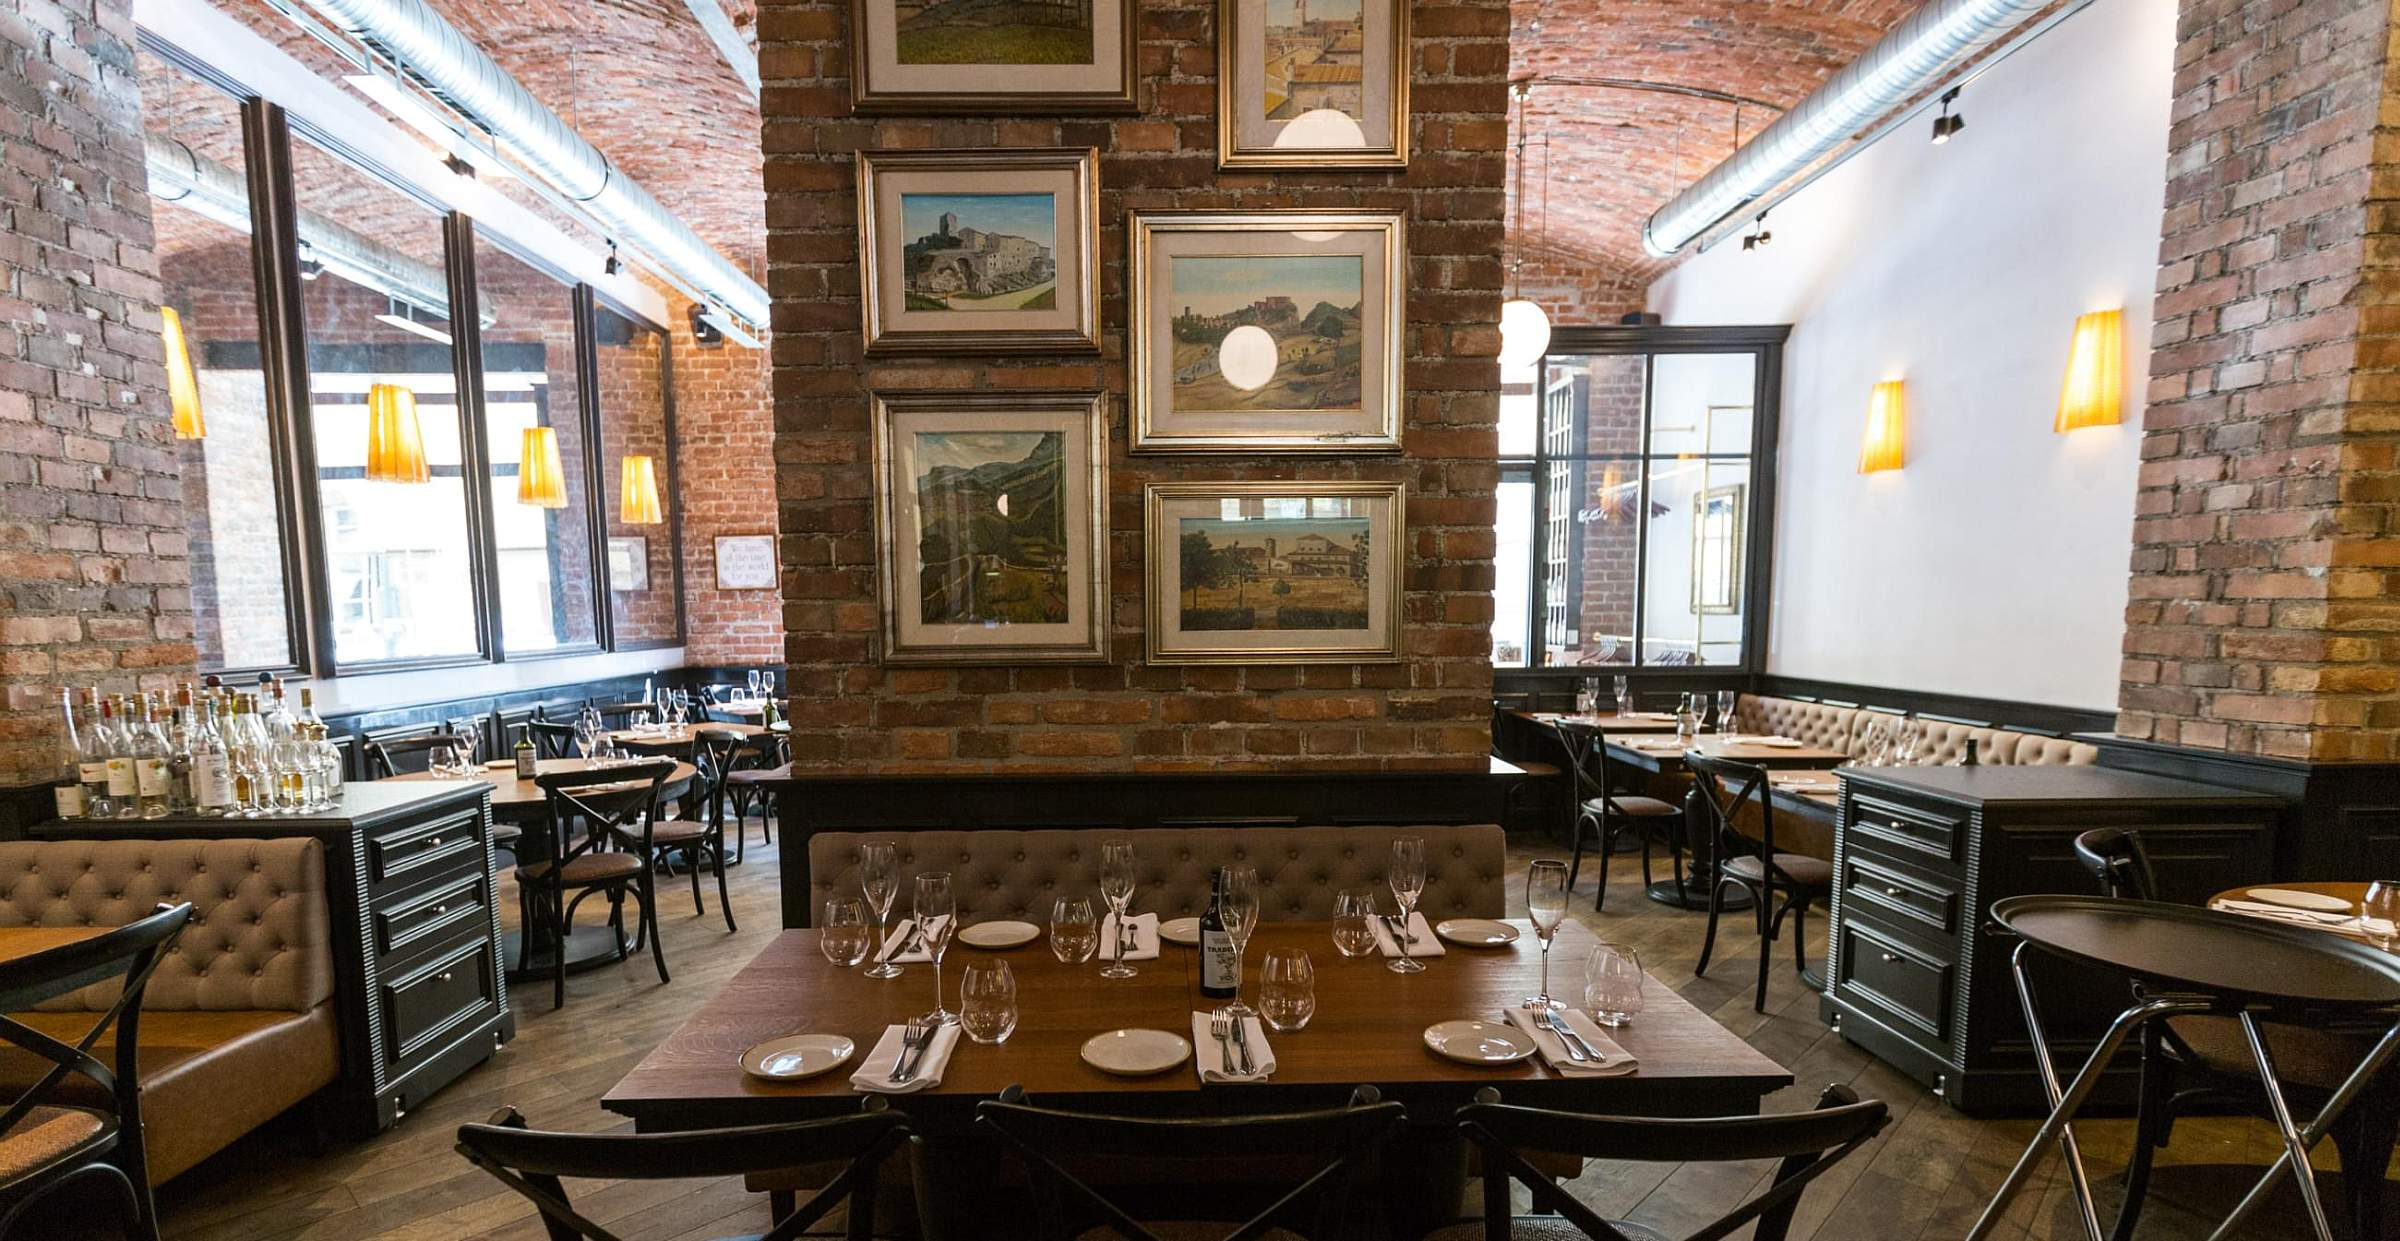 Recenze la finestra in cucina foodology for Finestra in cucina